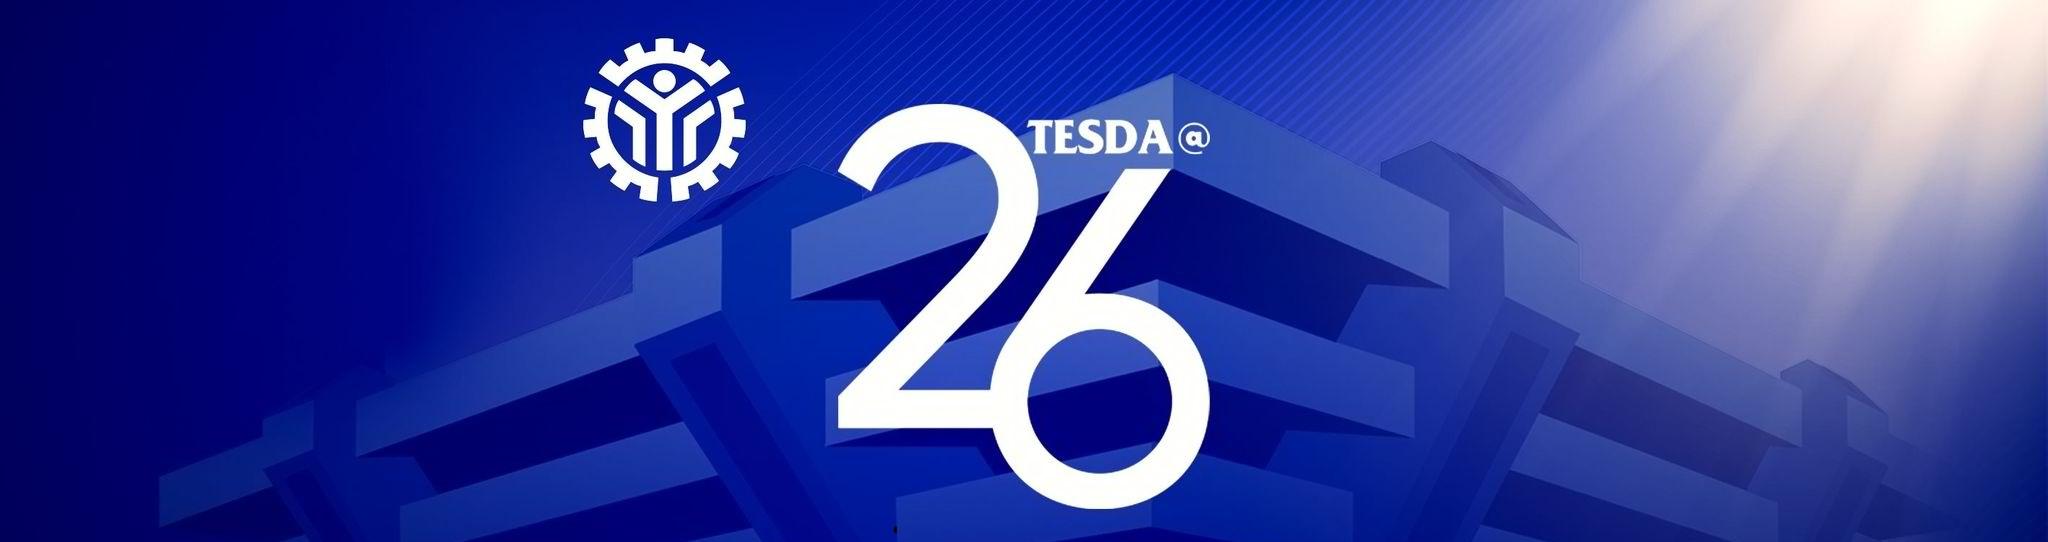 26th TESDA Anniversary 1